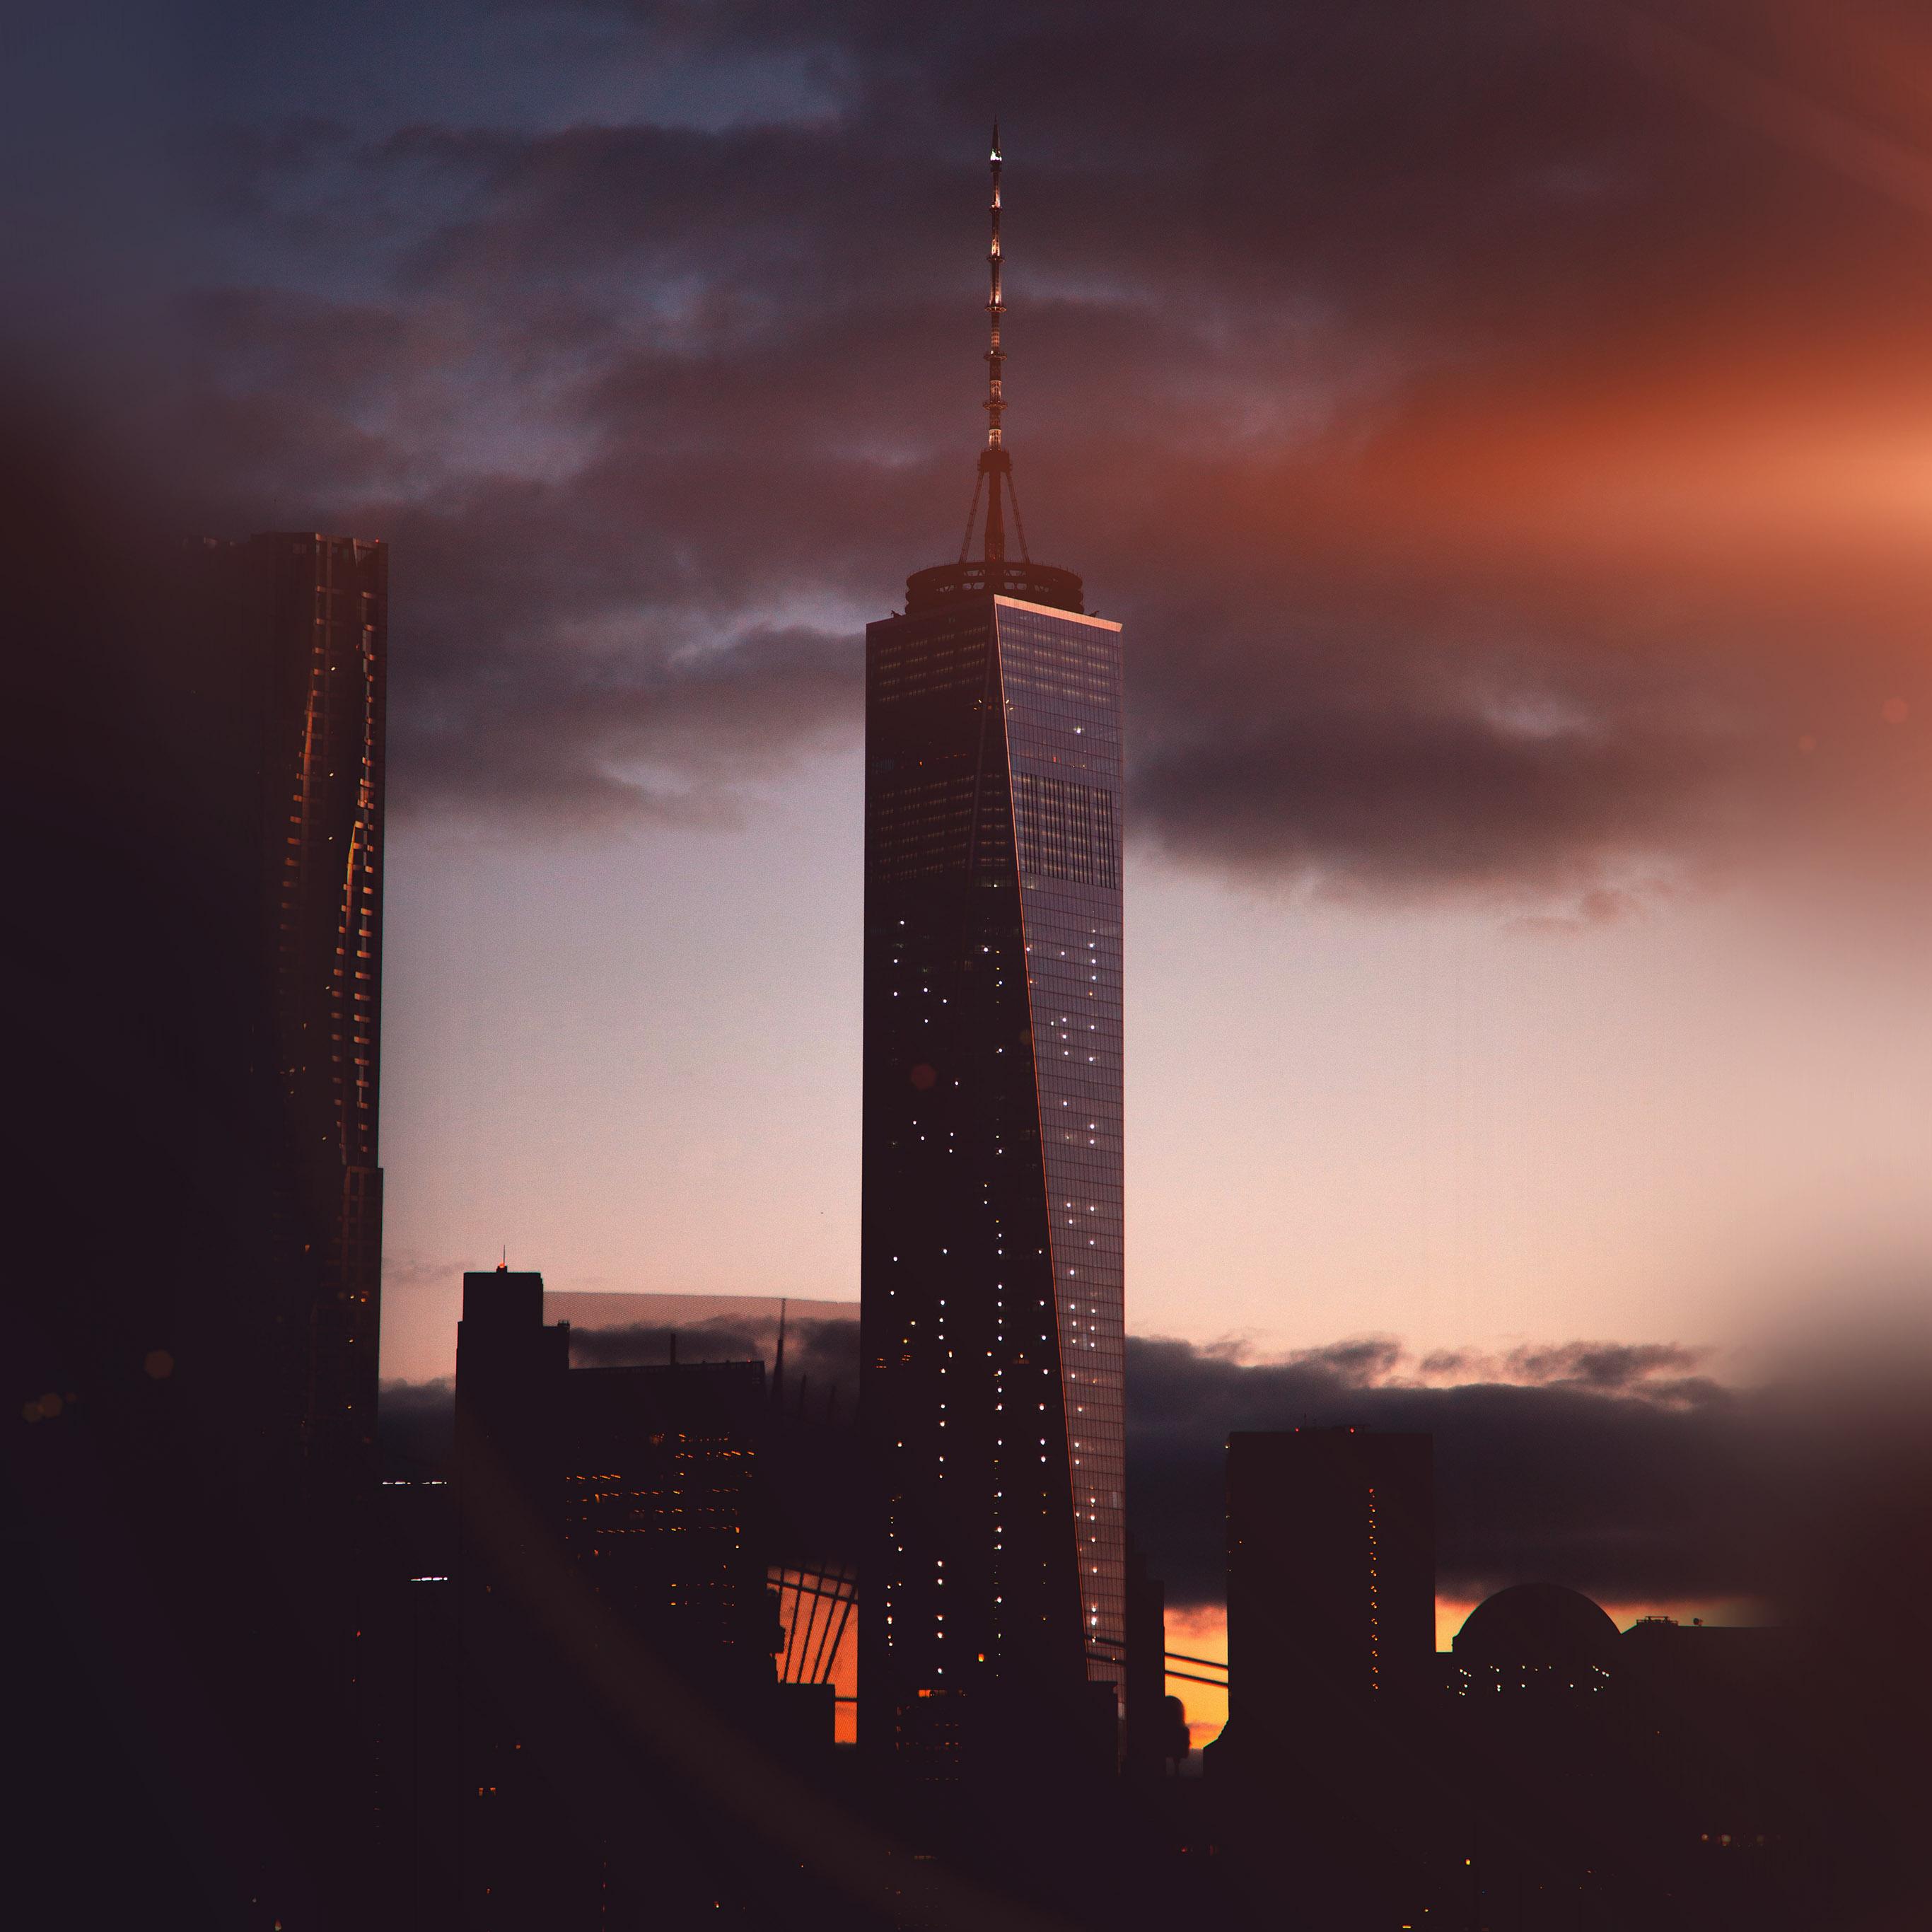 Nc36 City Tower Skyline Night Flare Wallpaper